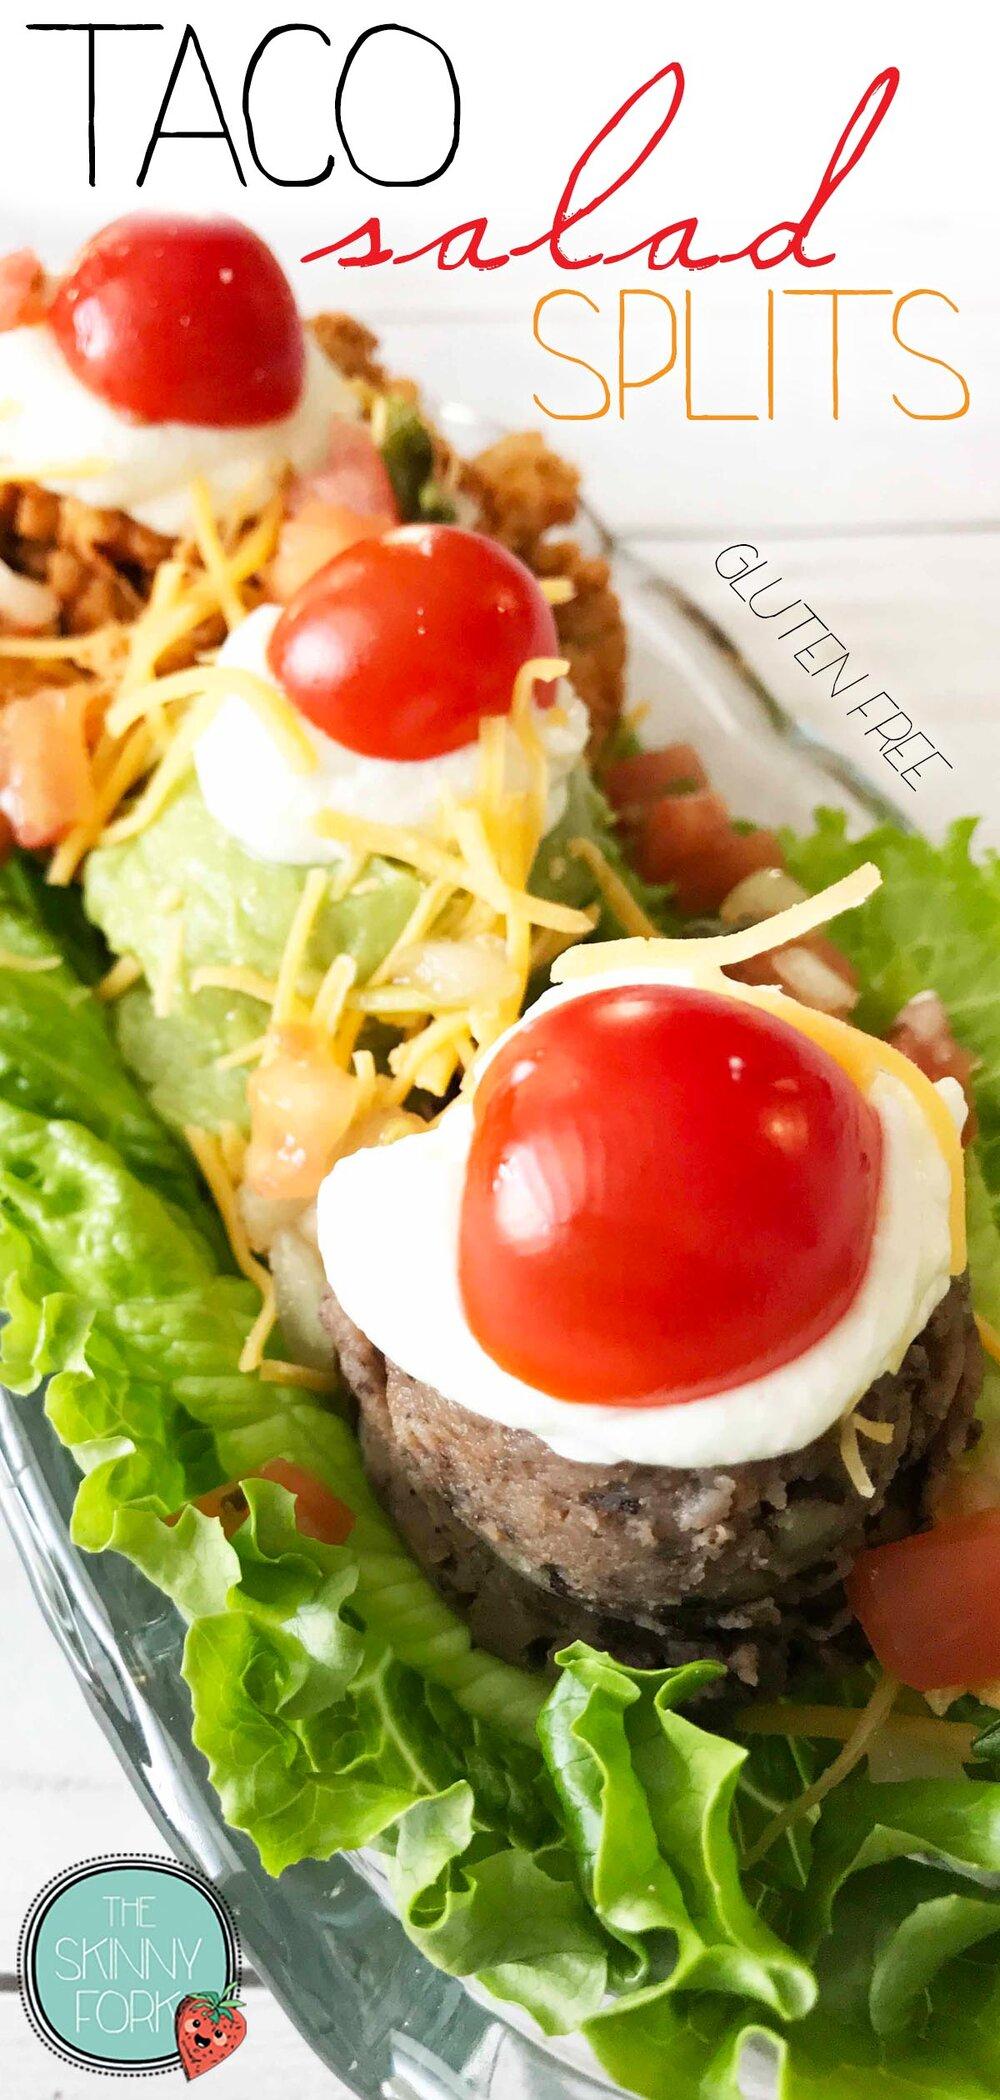 taco-salad-split-pin.jpg